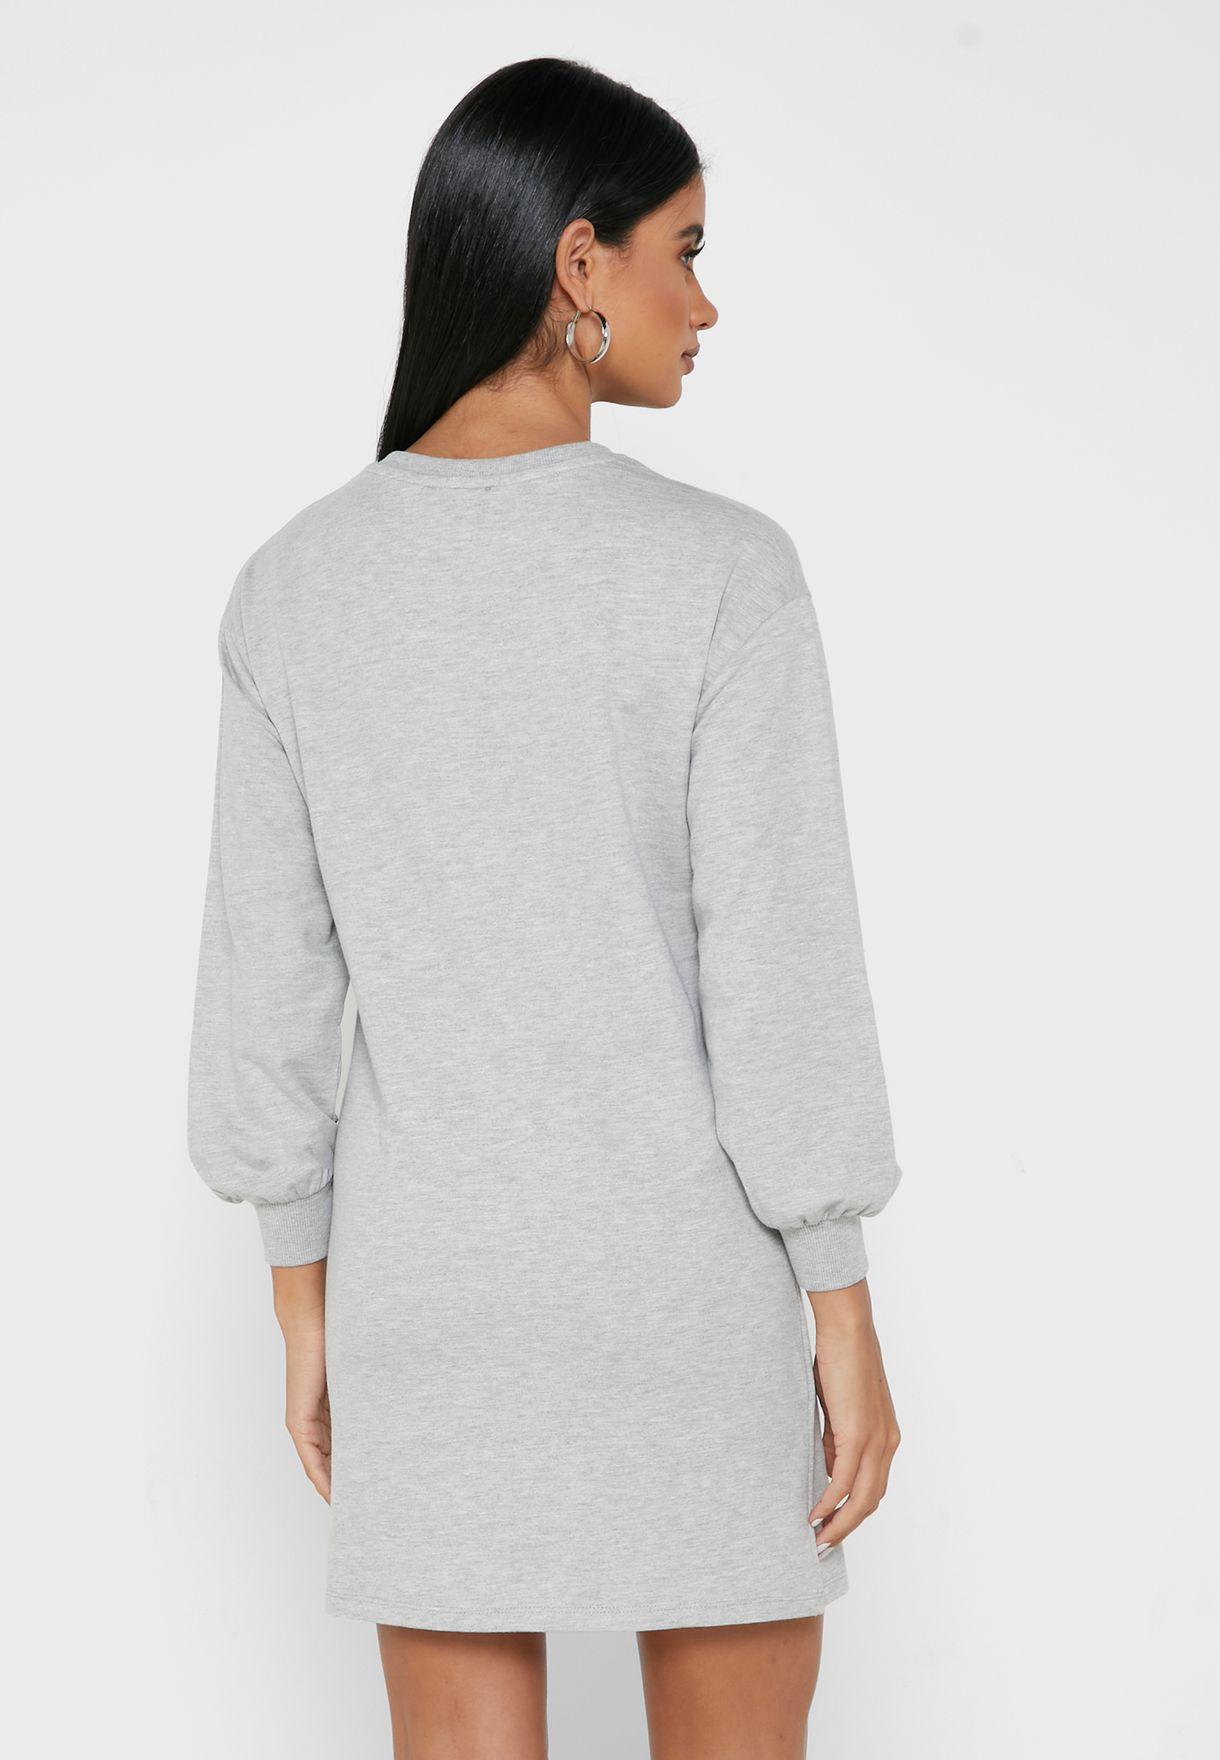 Oversized Slogan Sweat Dress